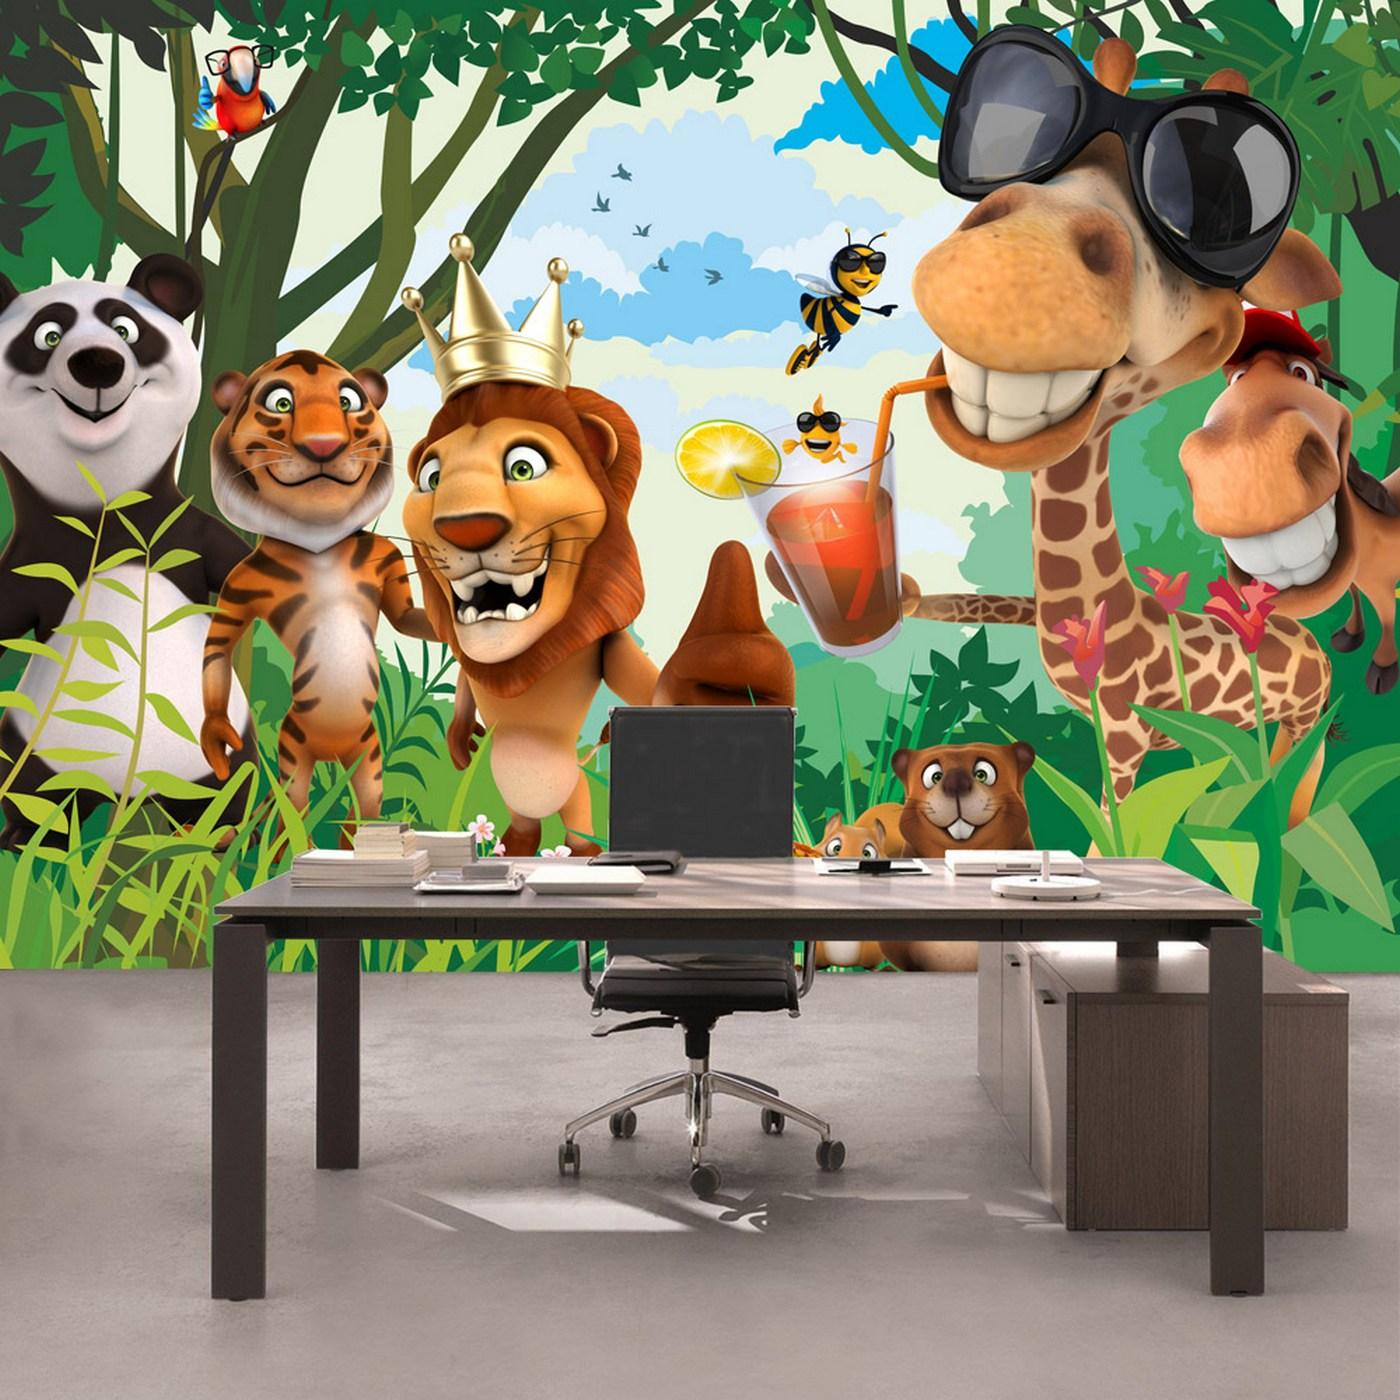 Tapete kinderzimmer tiere  KiSS!, Fototapeten zu besten Preisen. - Fototapete Jungle Animals ...